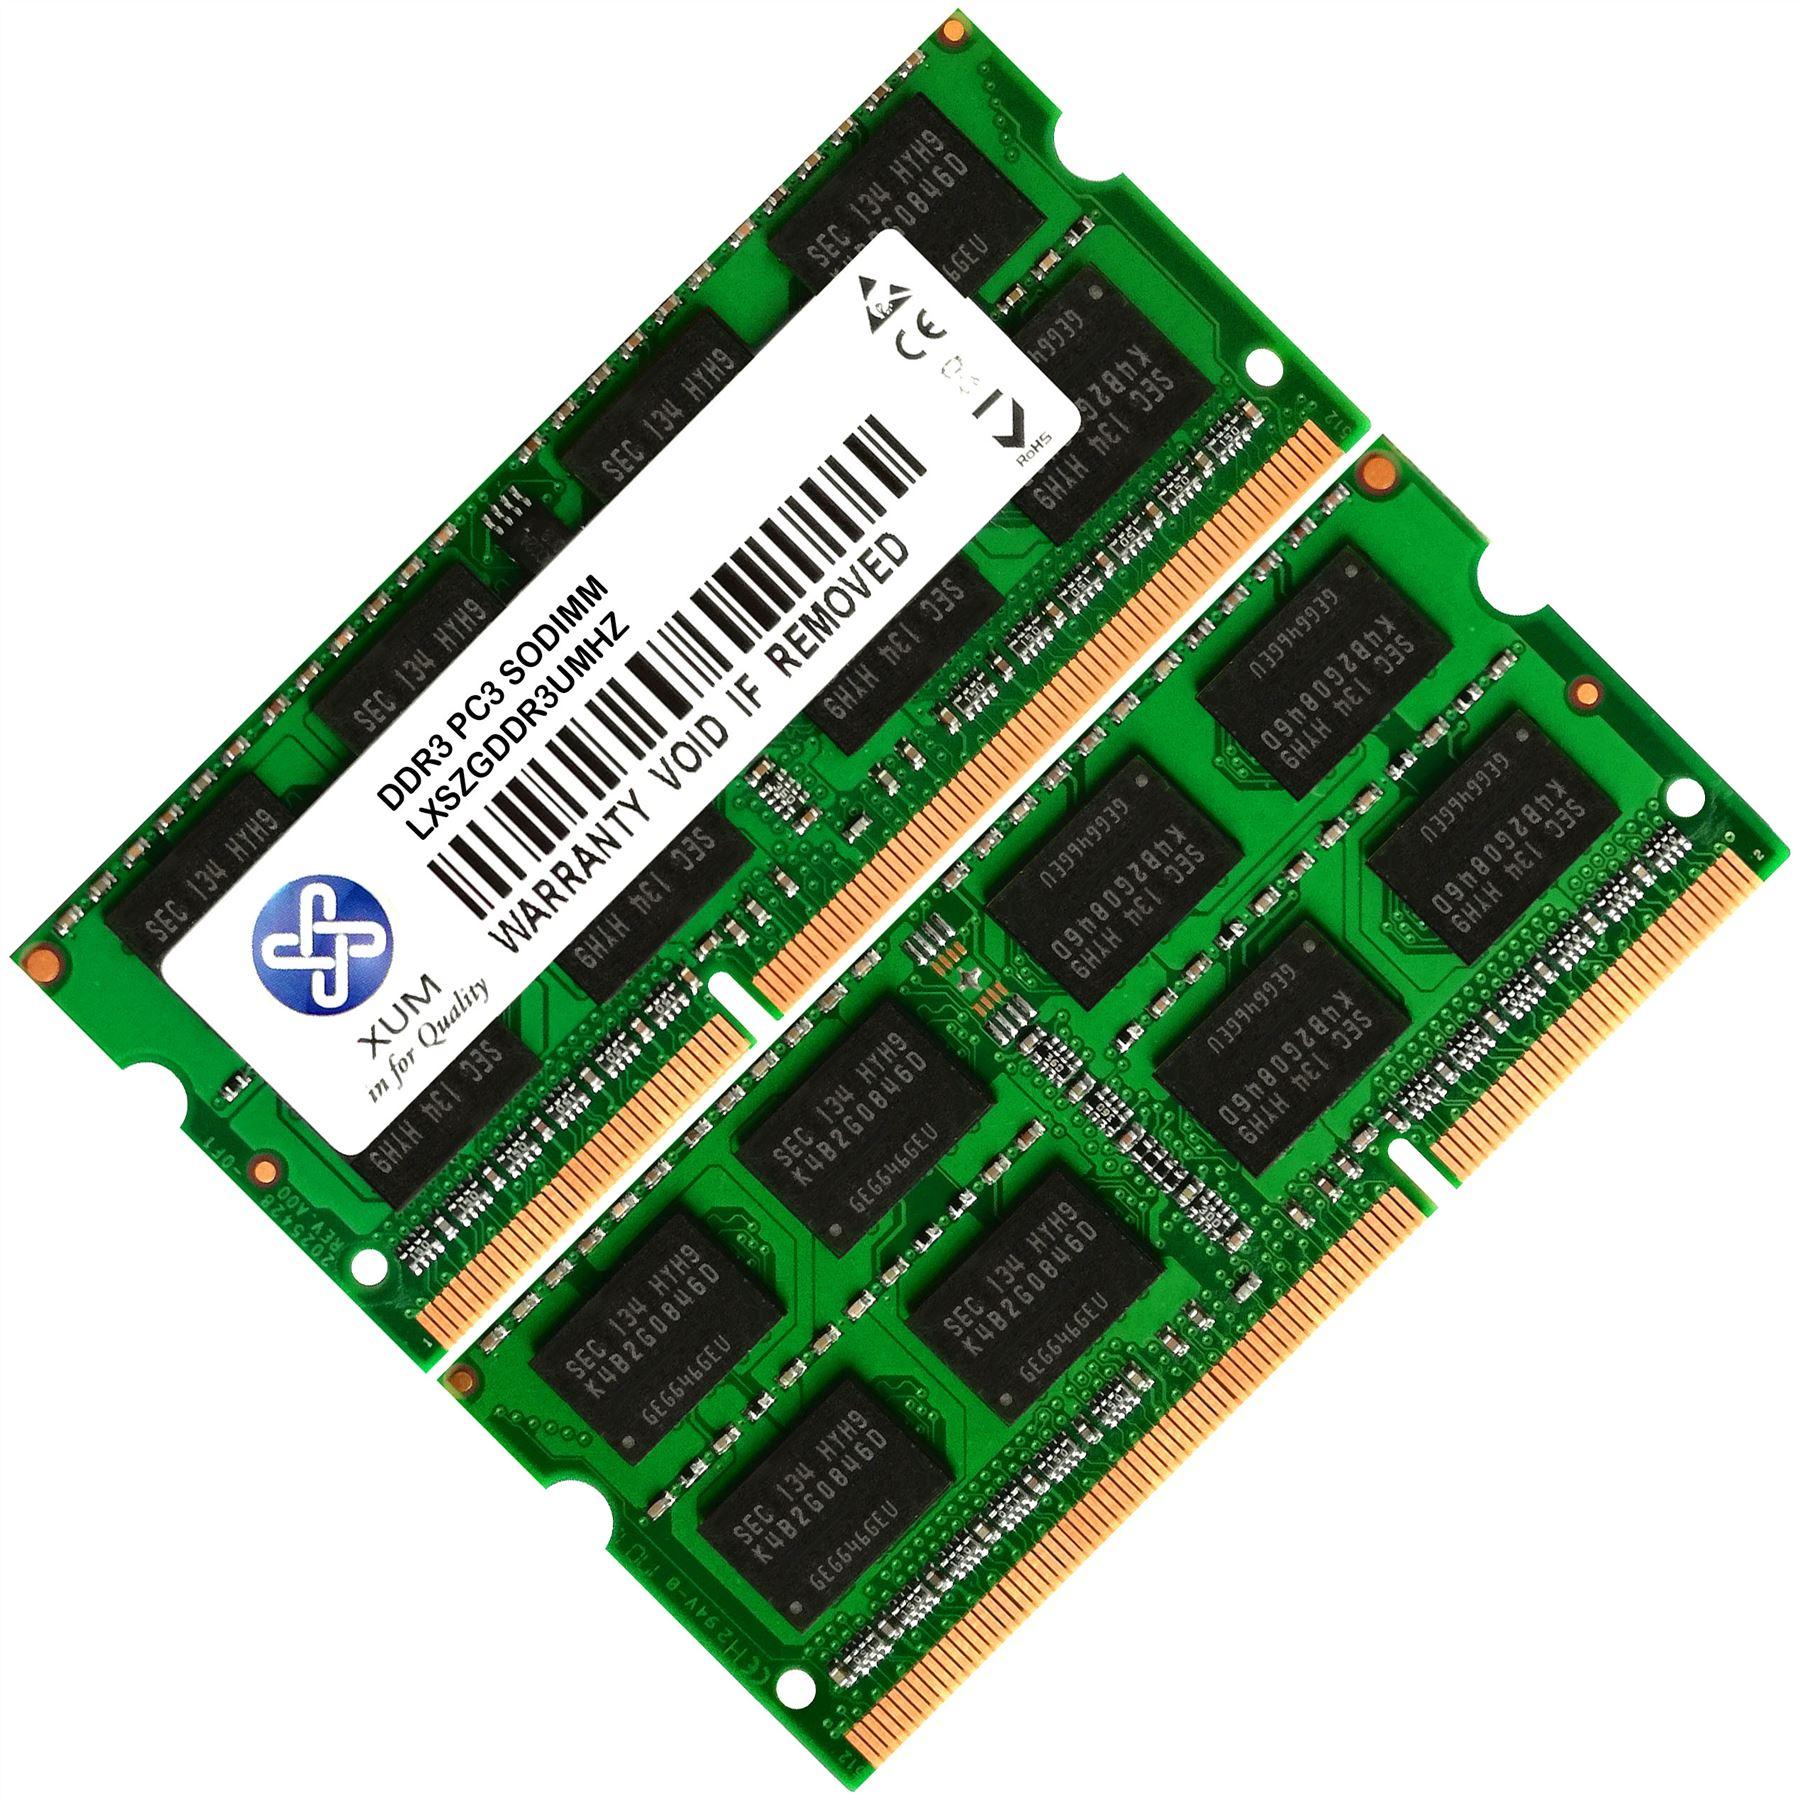 Memoria-Ram-4-Sony-VAIO-Desktop-Laptop-VGC-S110FL-VPCJ110FL-Nuevo-2x-Lot